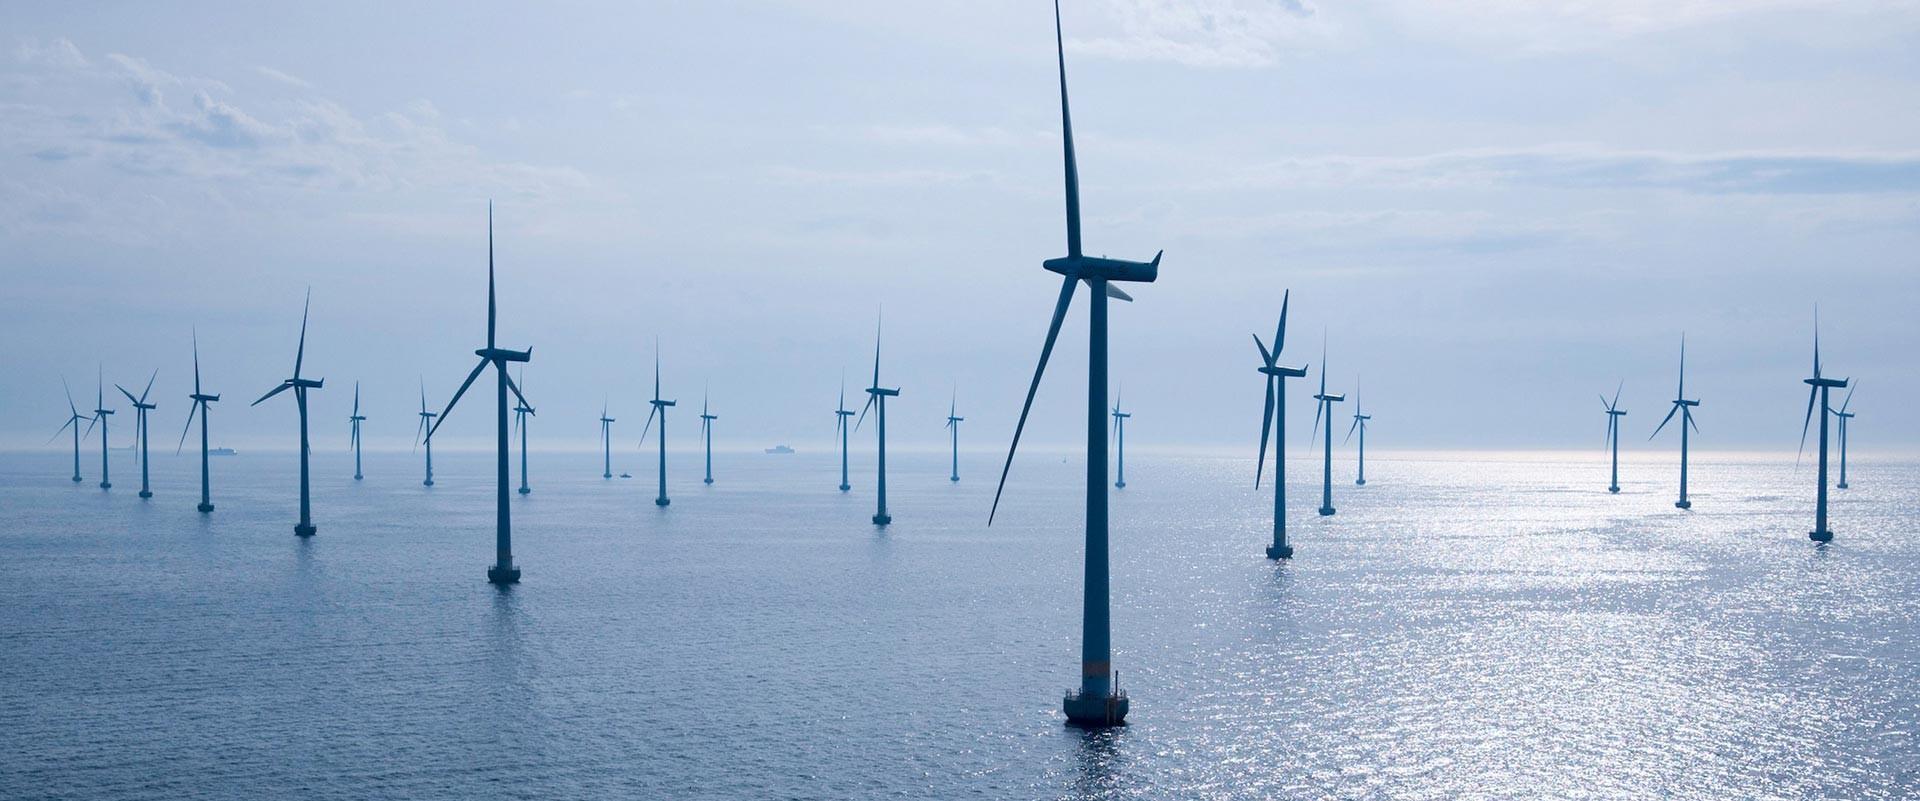 windmills-ips-danmark